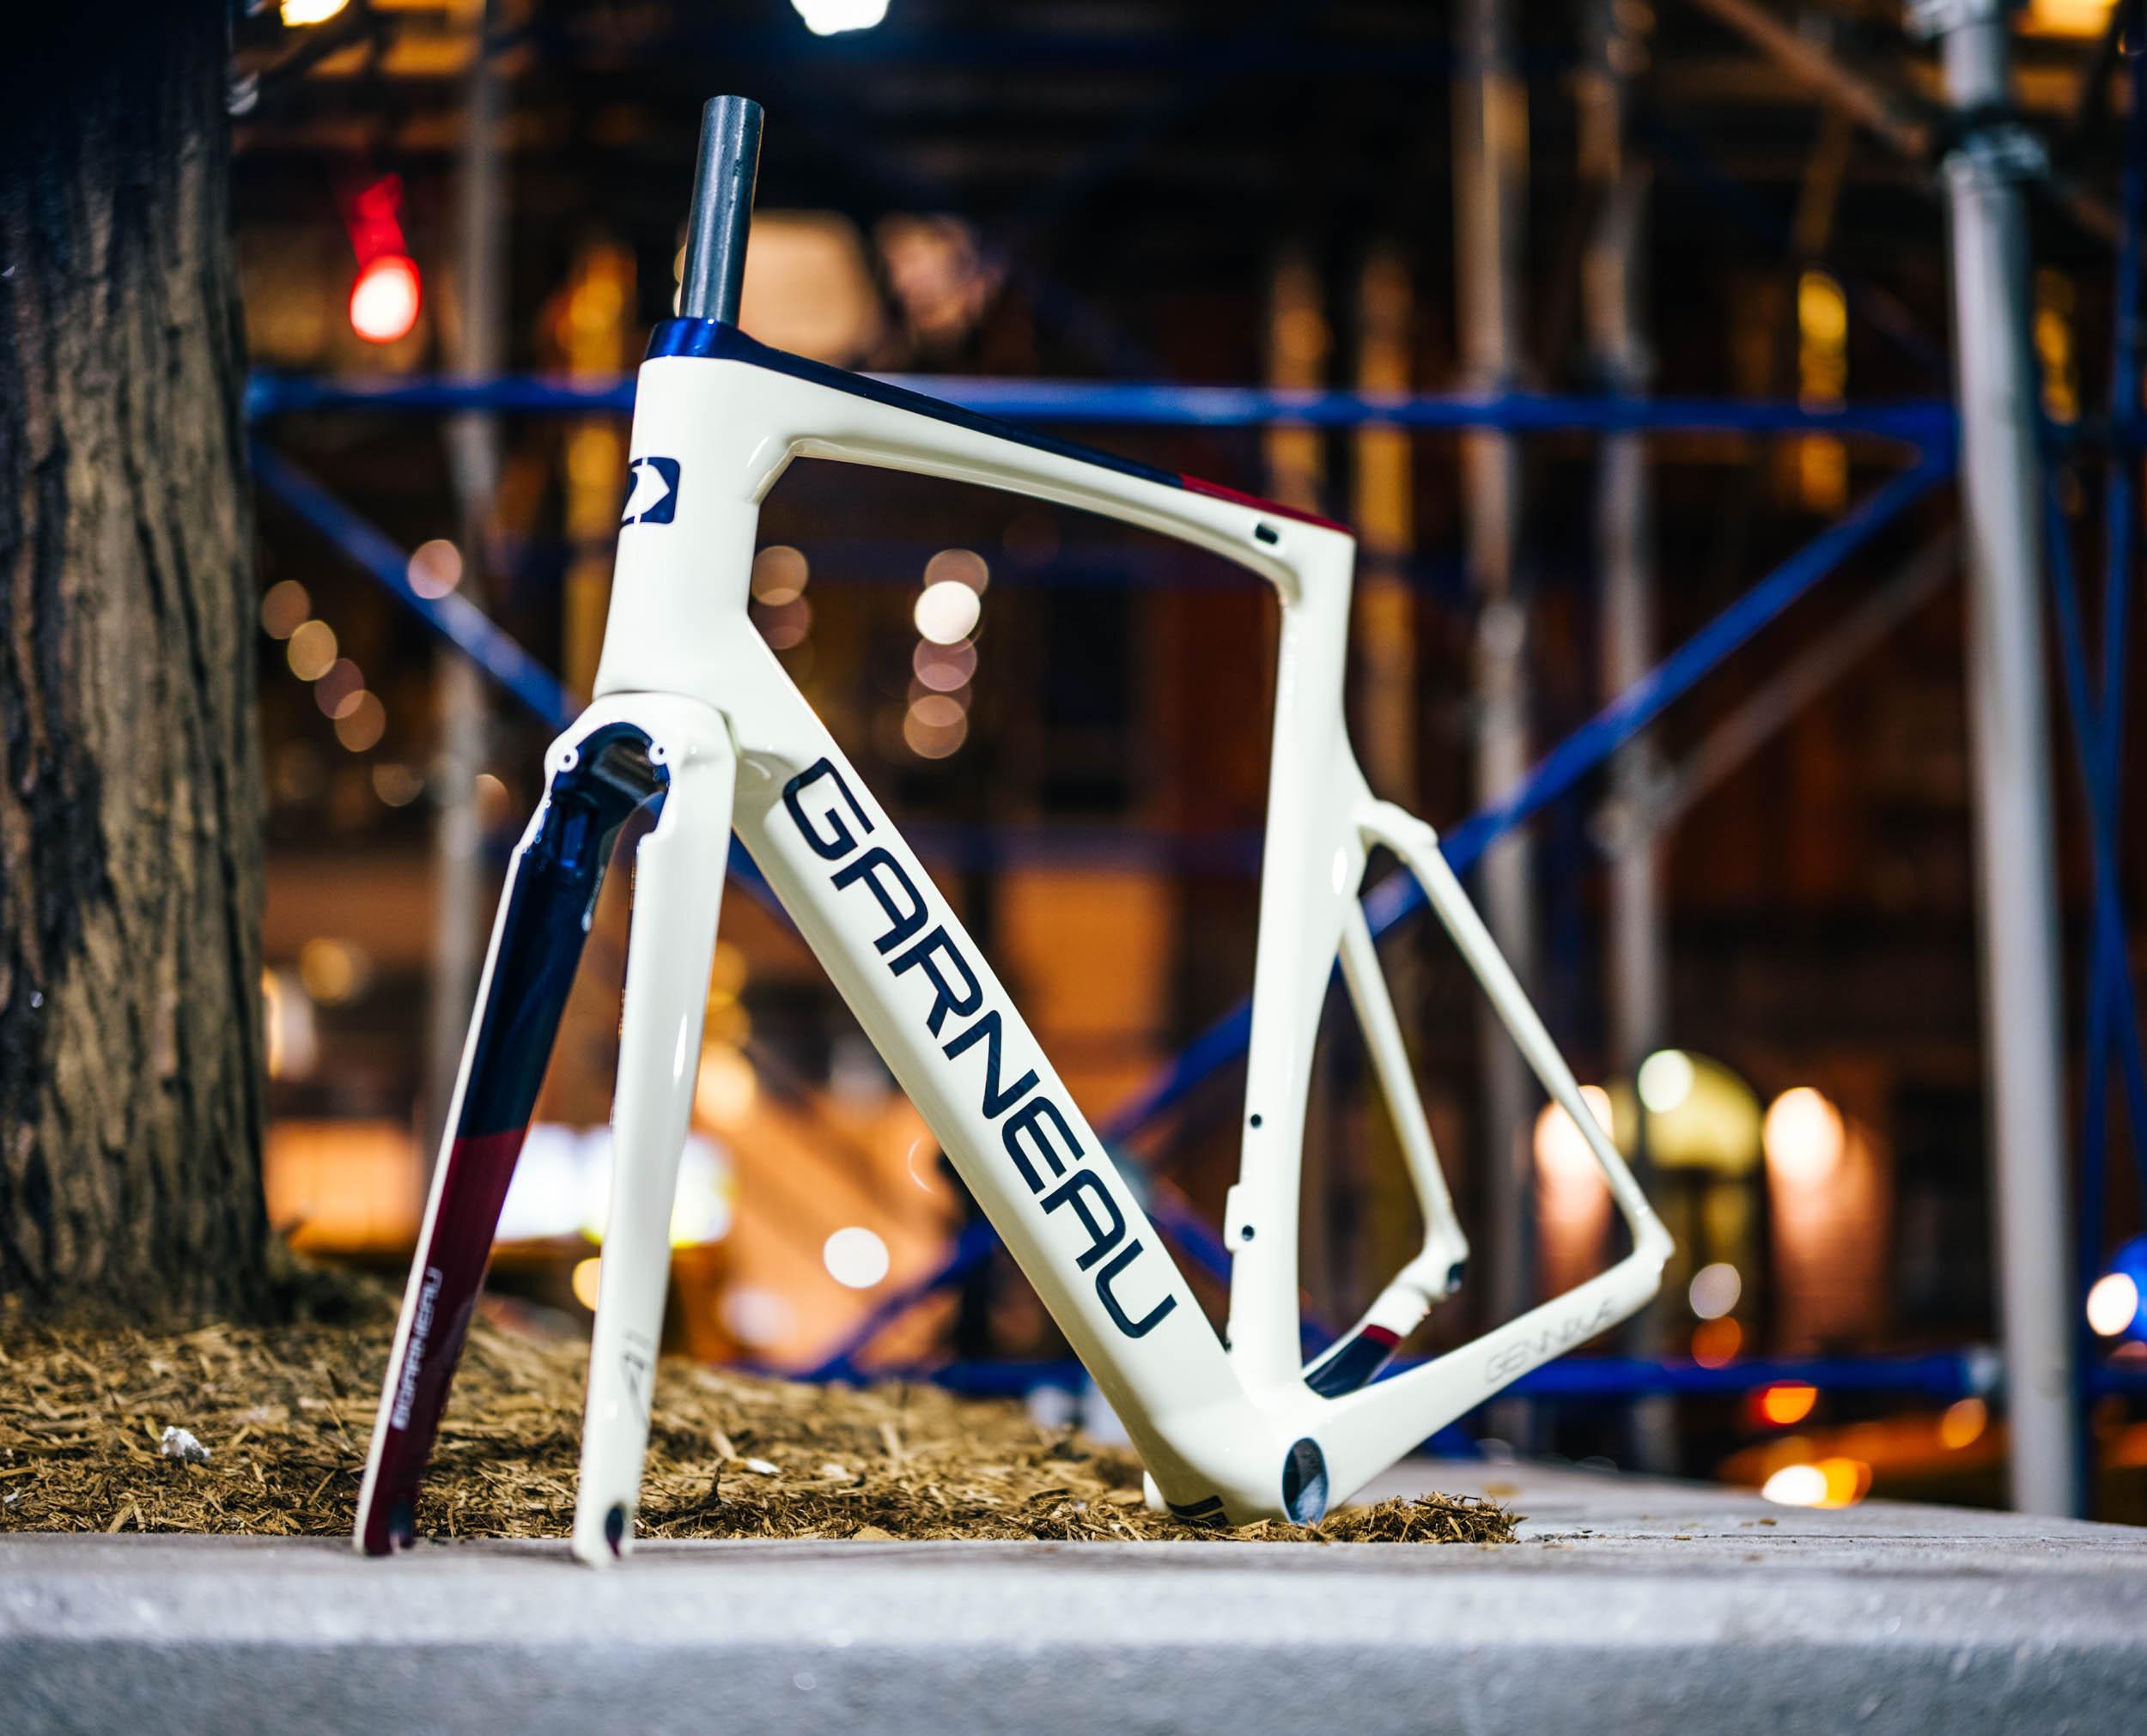 to-be-determined-photo-rhetoric-garneau-team-bikes-110.jpg